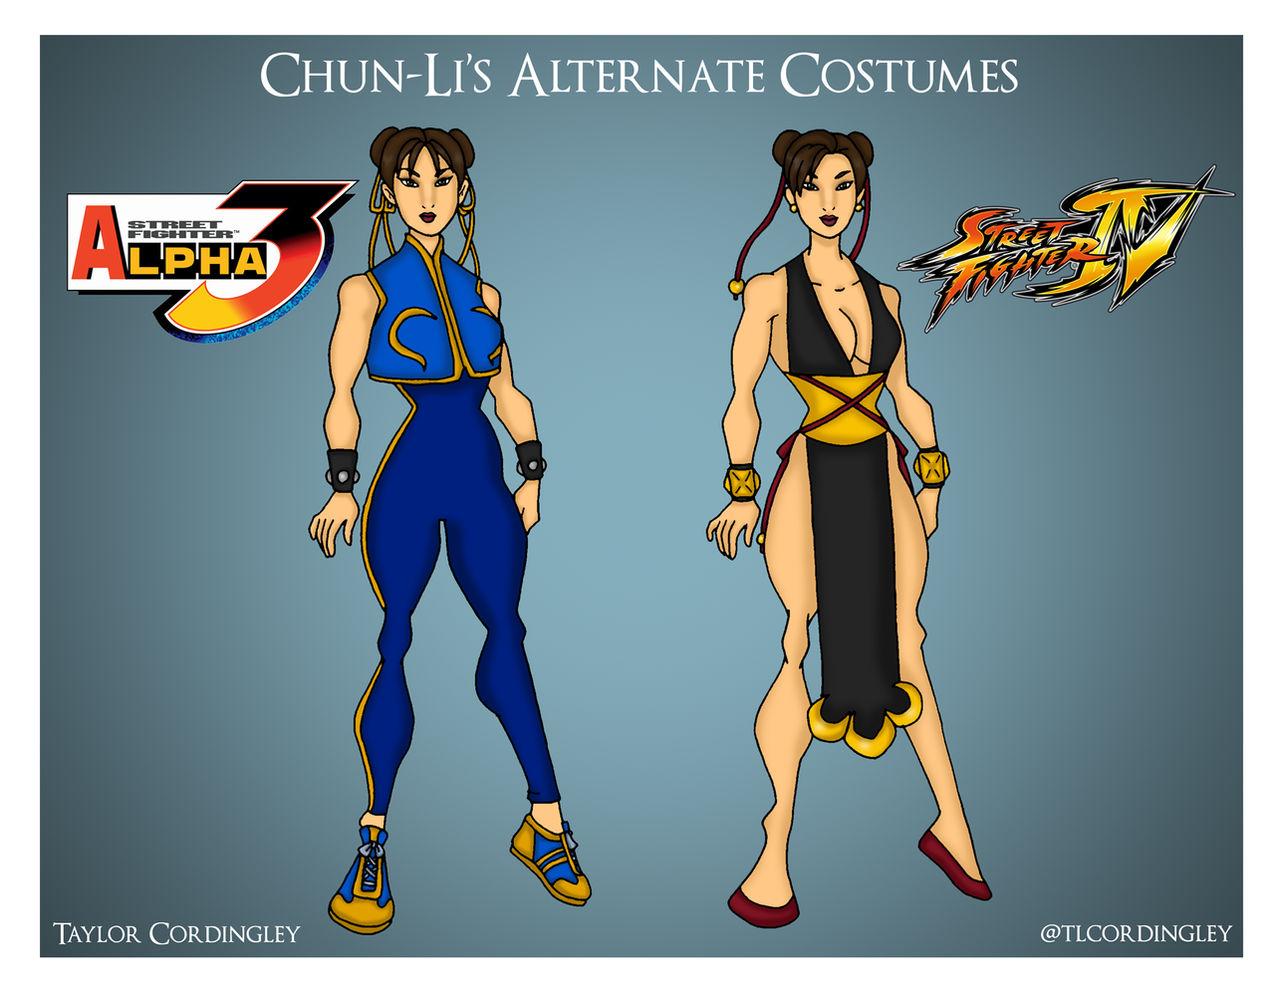 Street Fighter Chun Li S Alternate Costumes By Femmes Fatales On